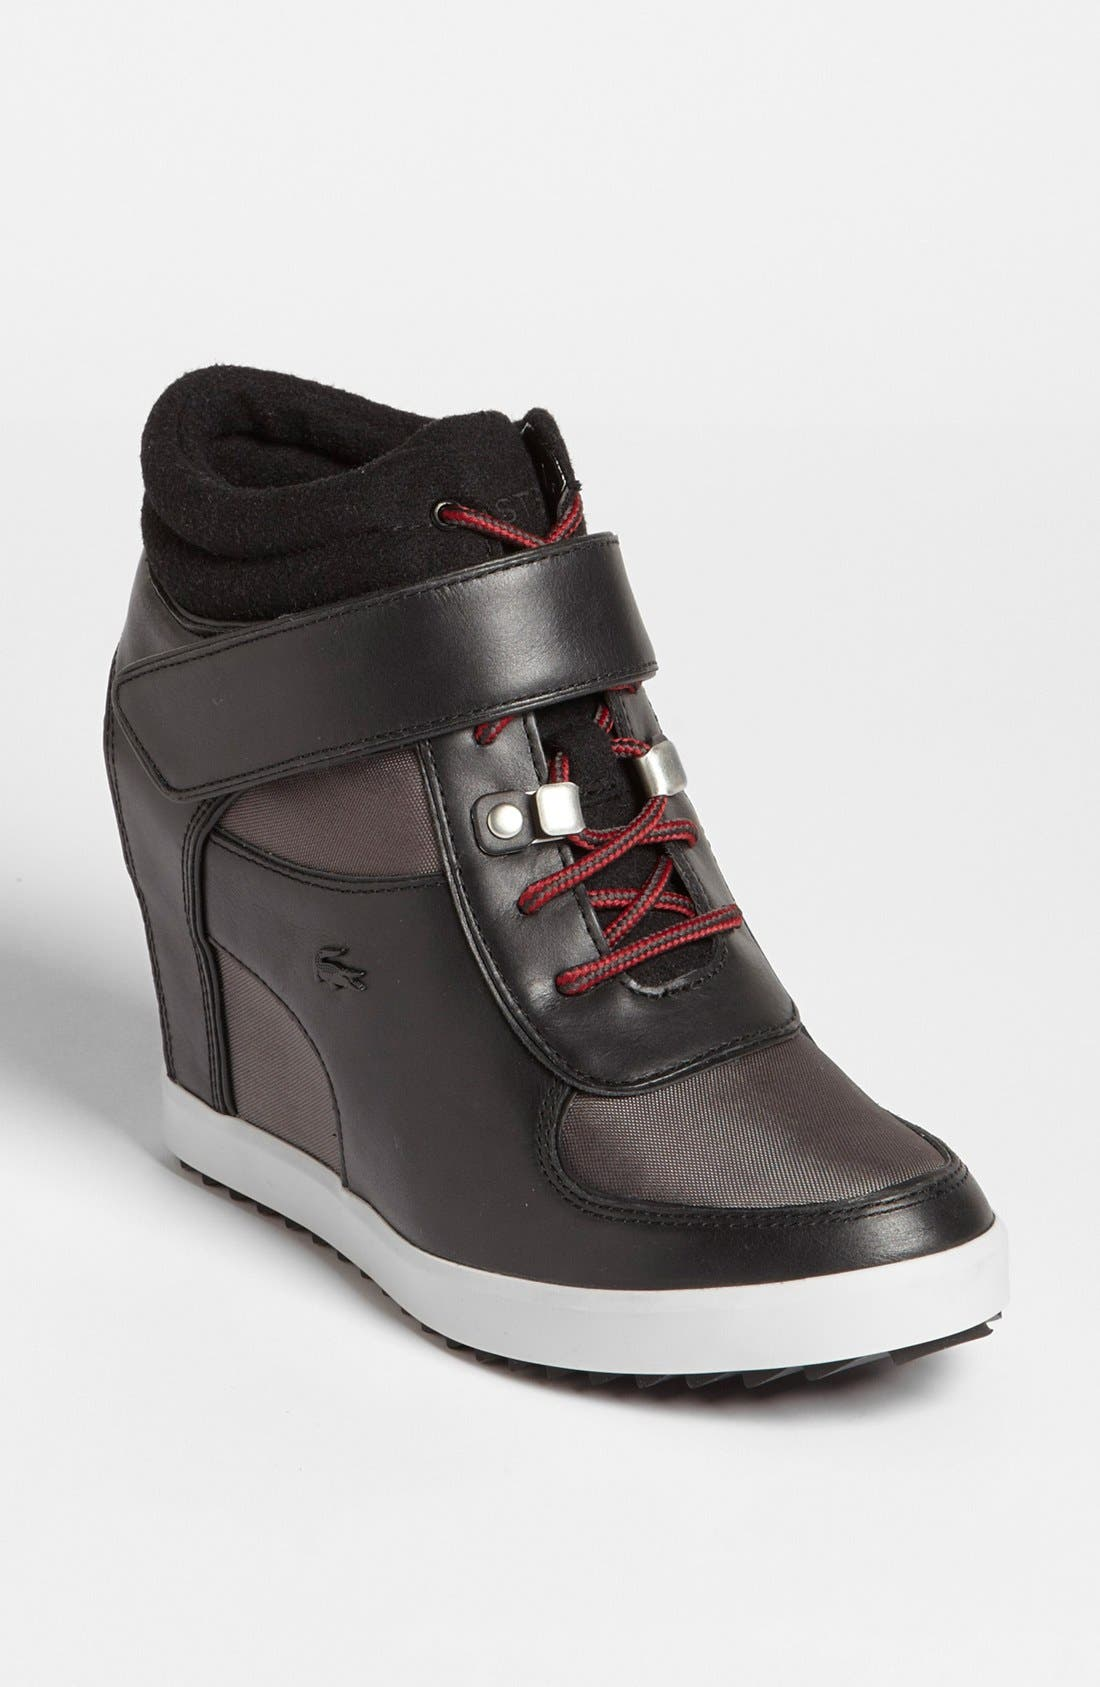 Alternate Image 1 Selected - Lacoste 'Berdine' Sneaker (Women)